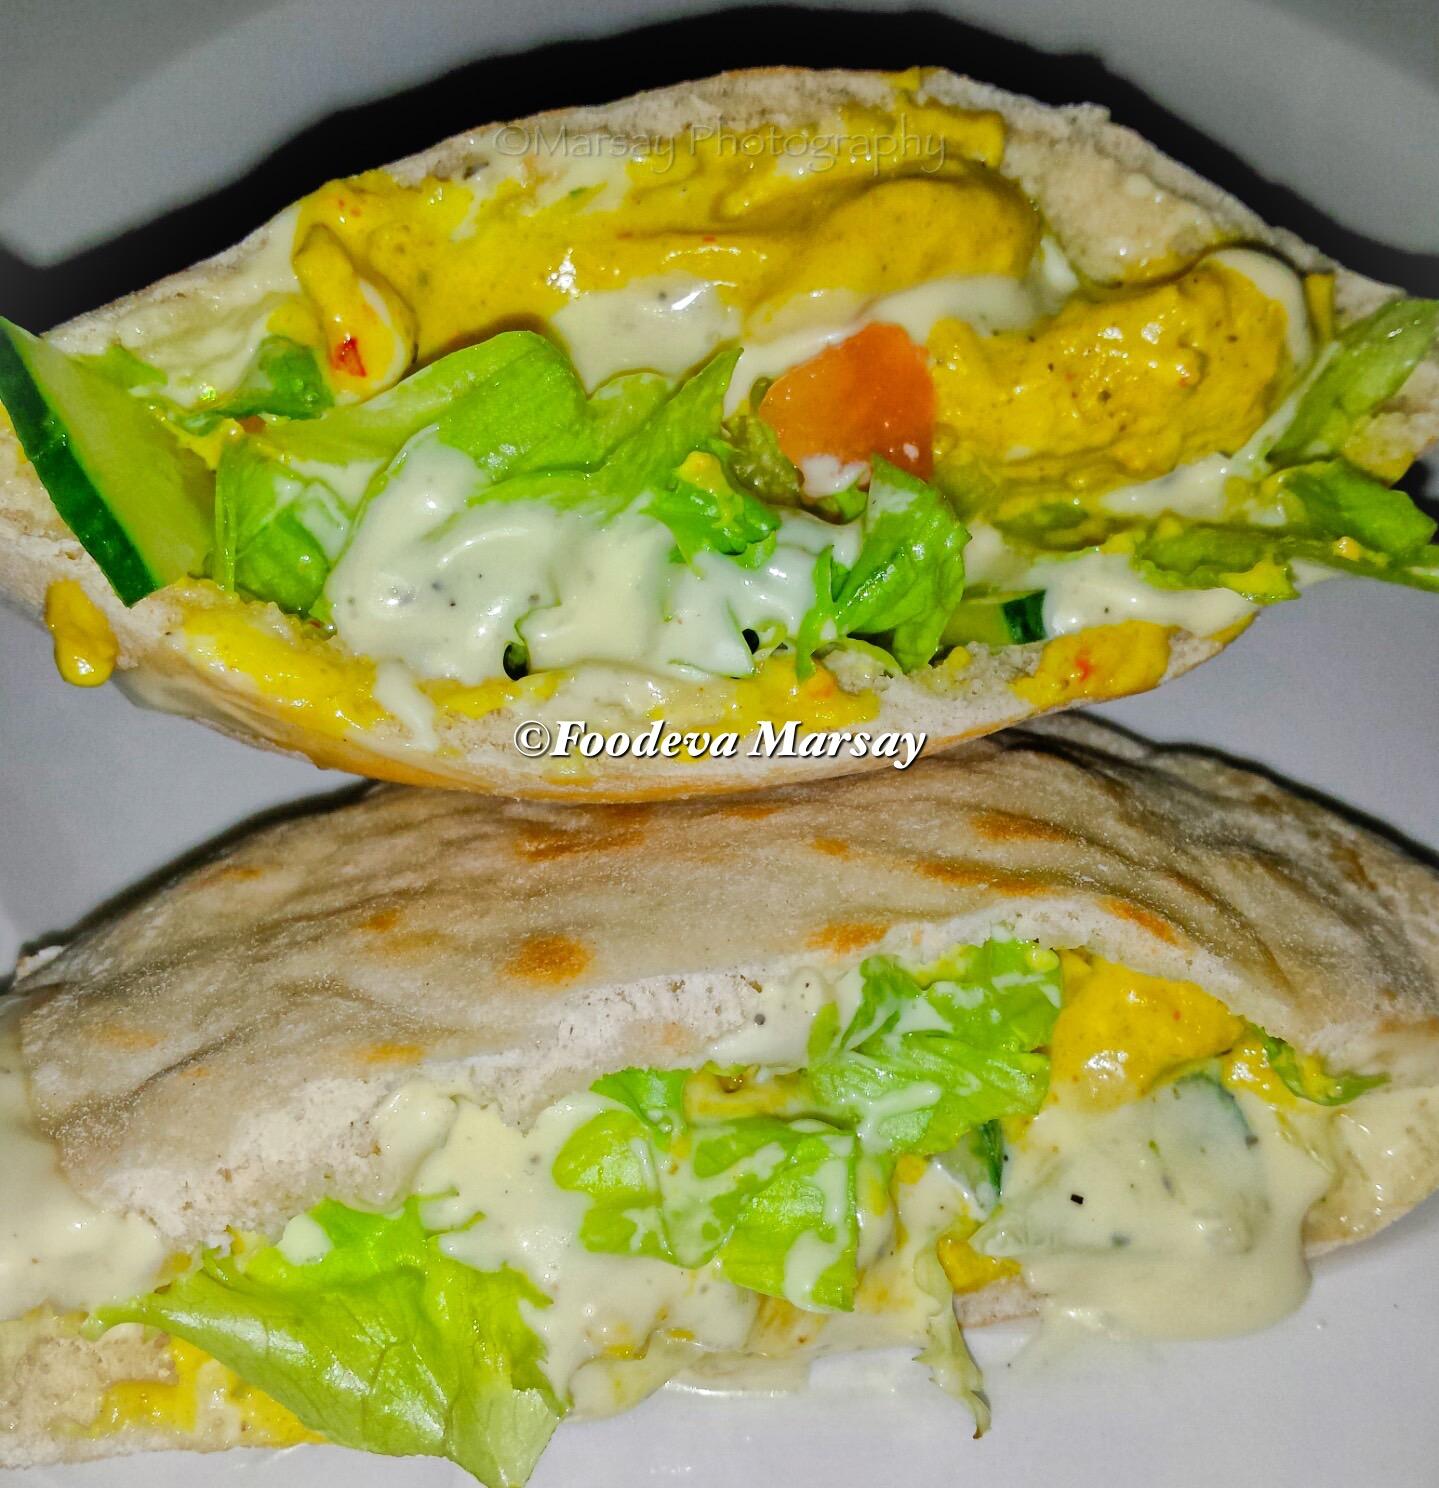 Tasty Nando's Chicken Strips in Pita Breads